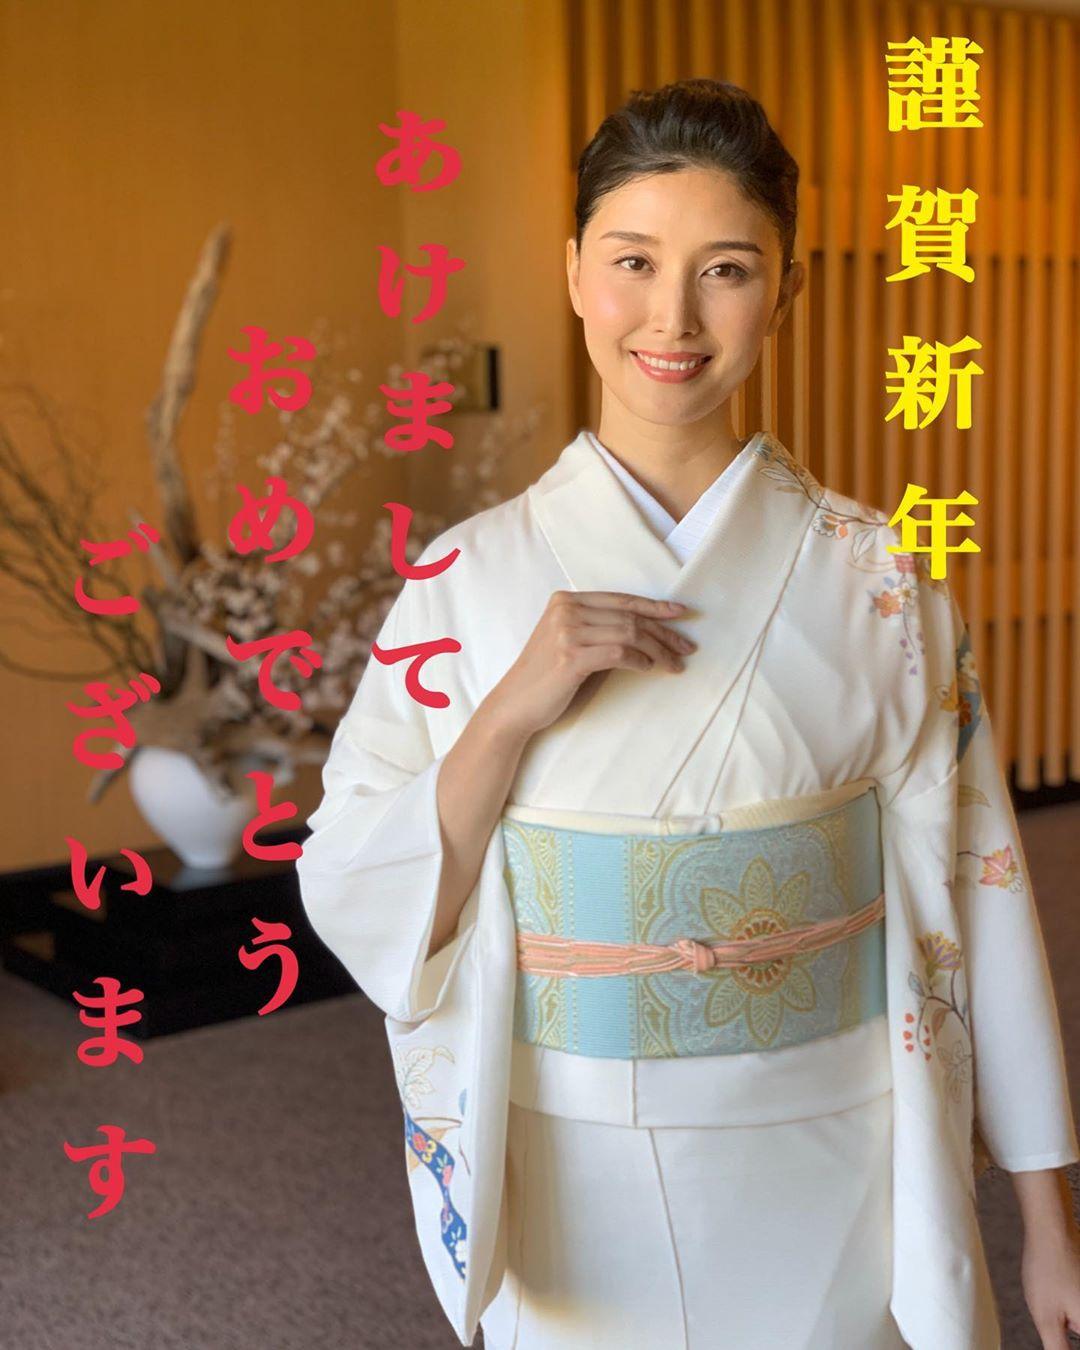 20NENGA_014_hashimoto_manami.jpg